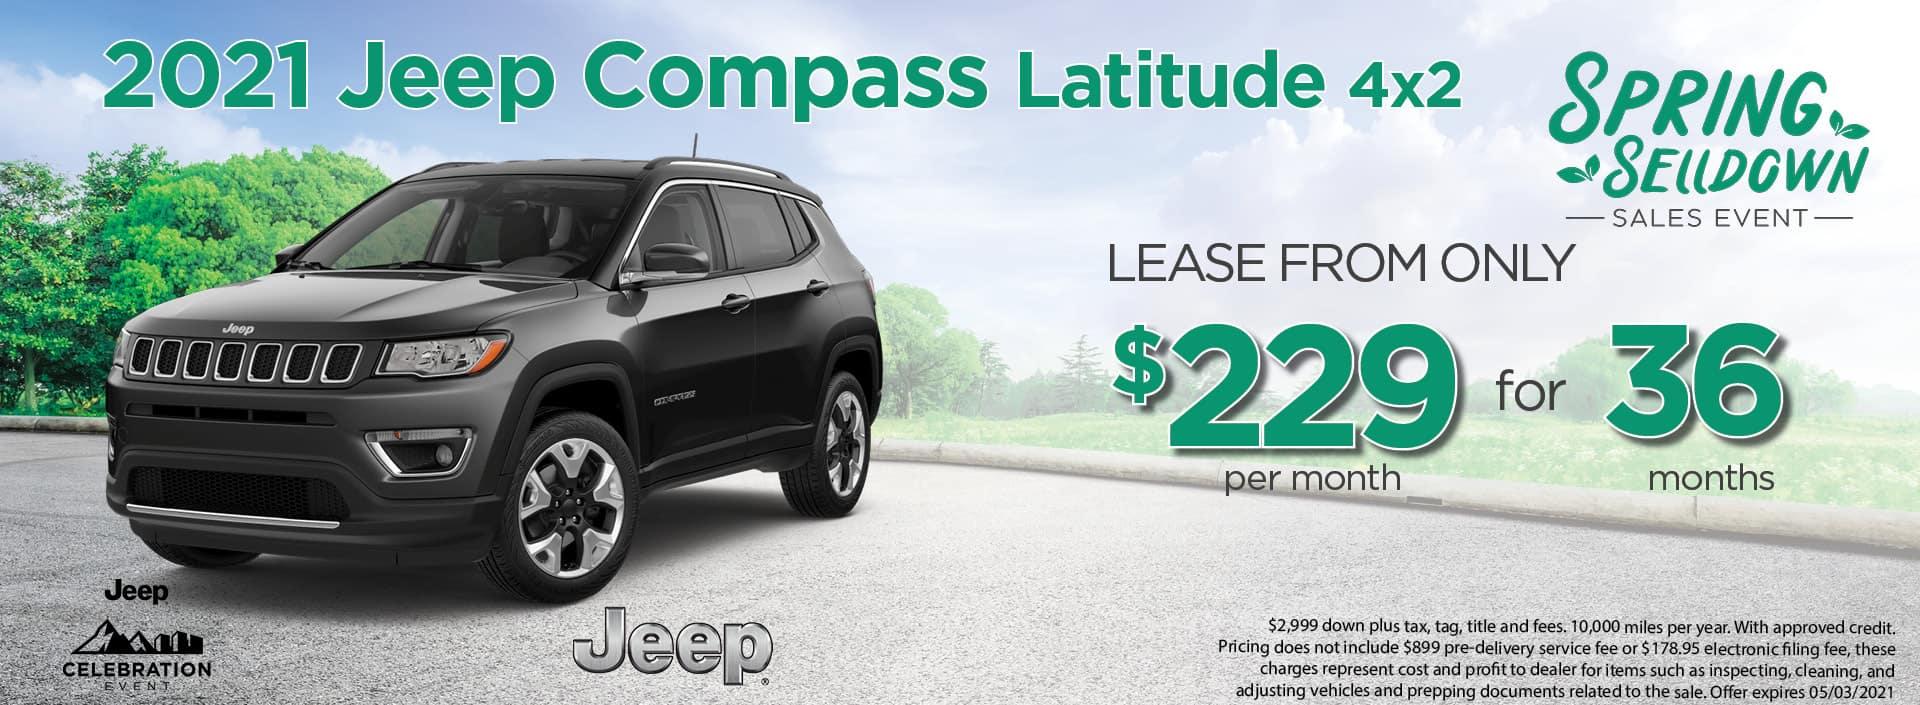 21 Compass Latitude 229mo